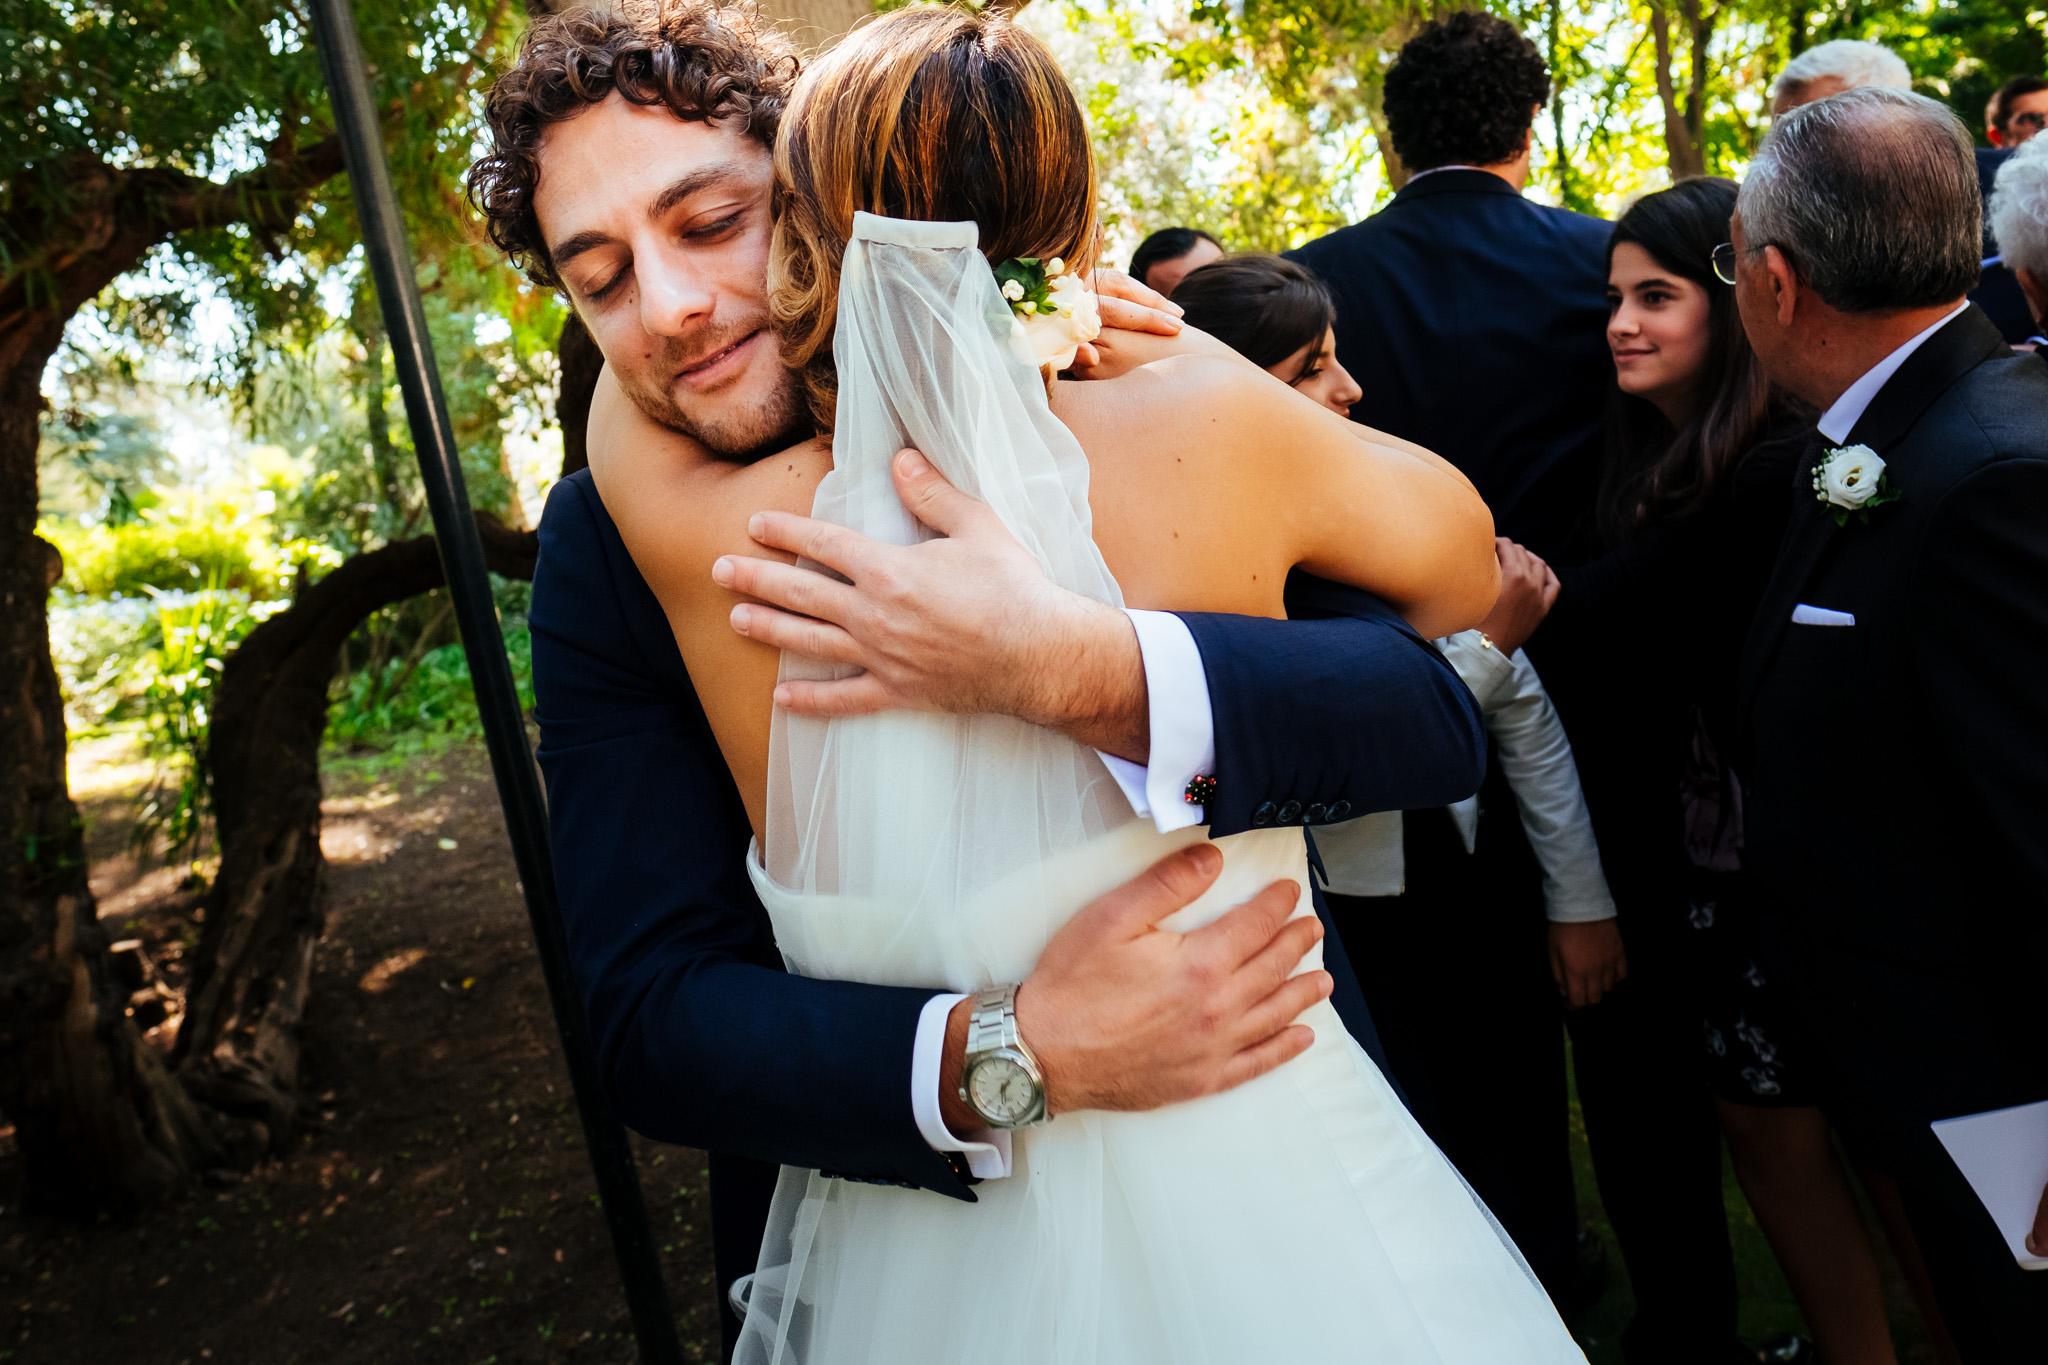 matrimonio-a-catania-41.jpg